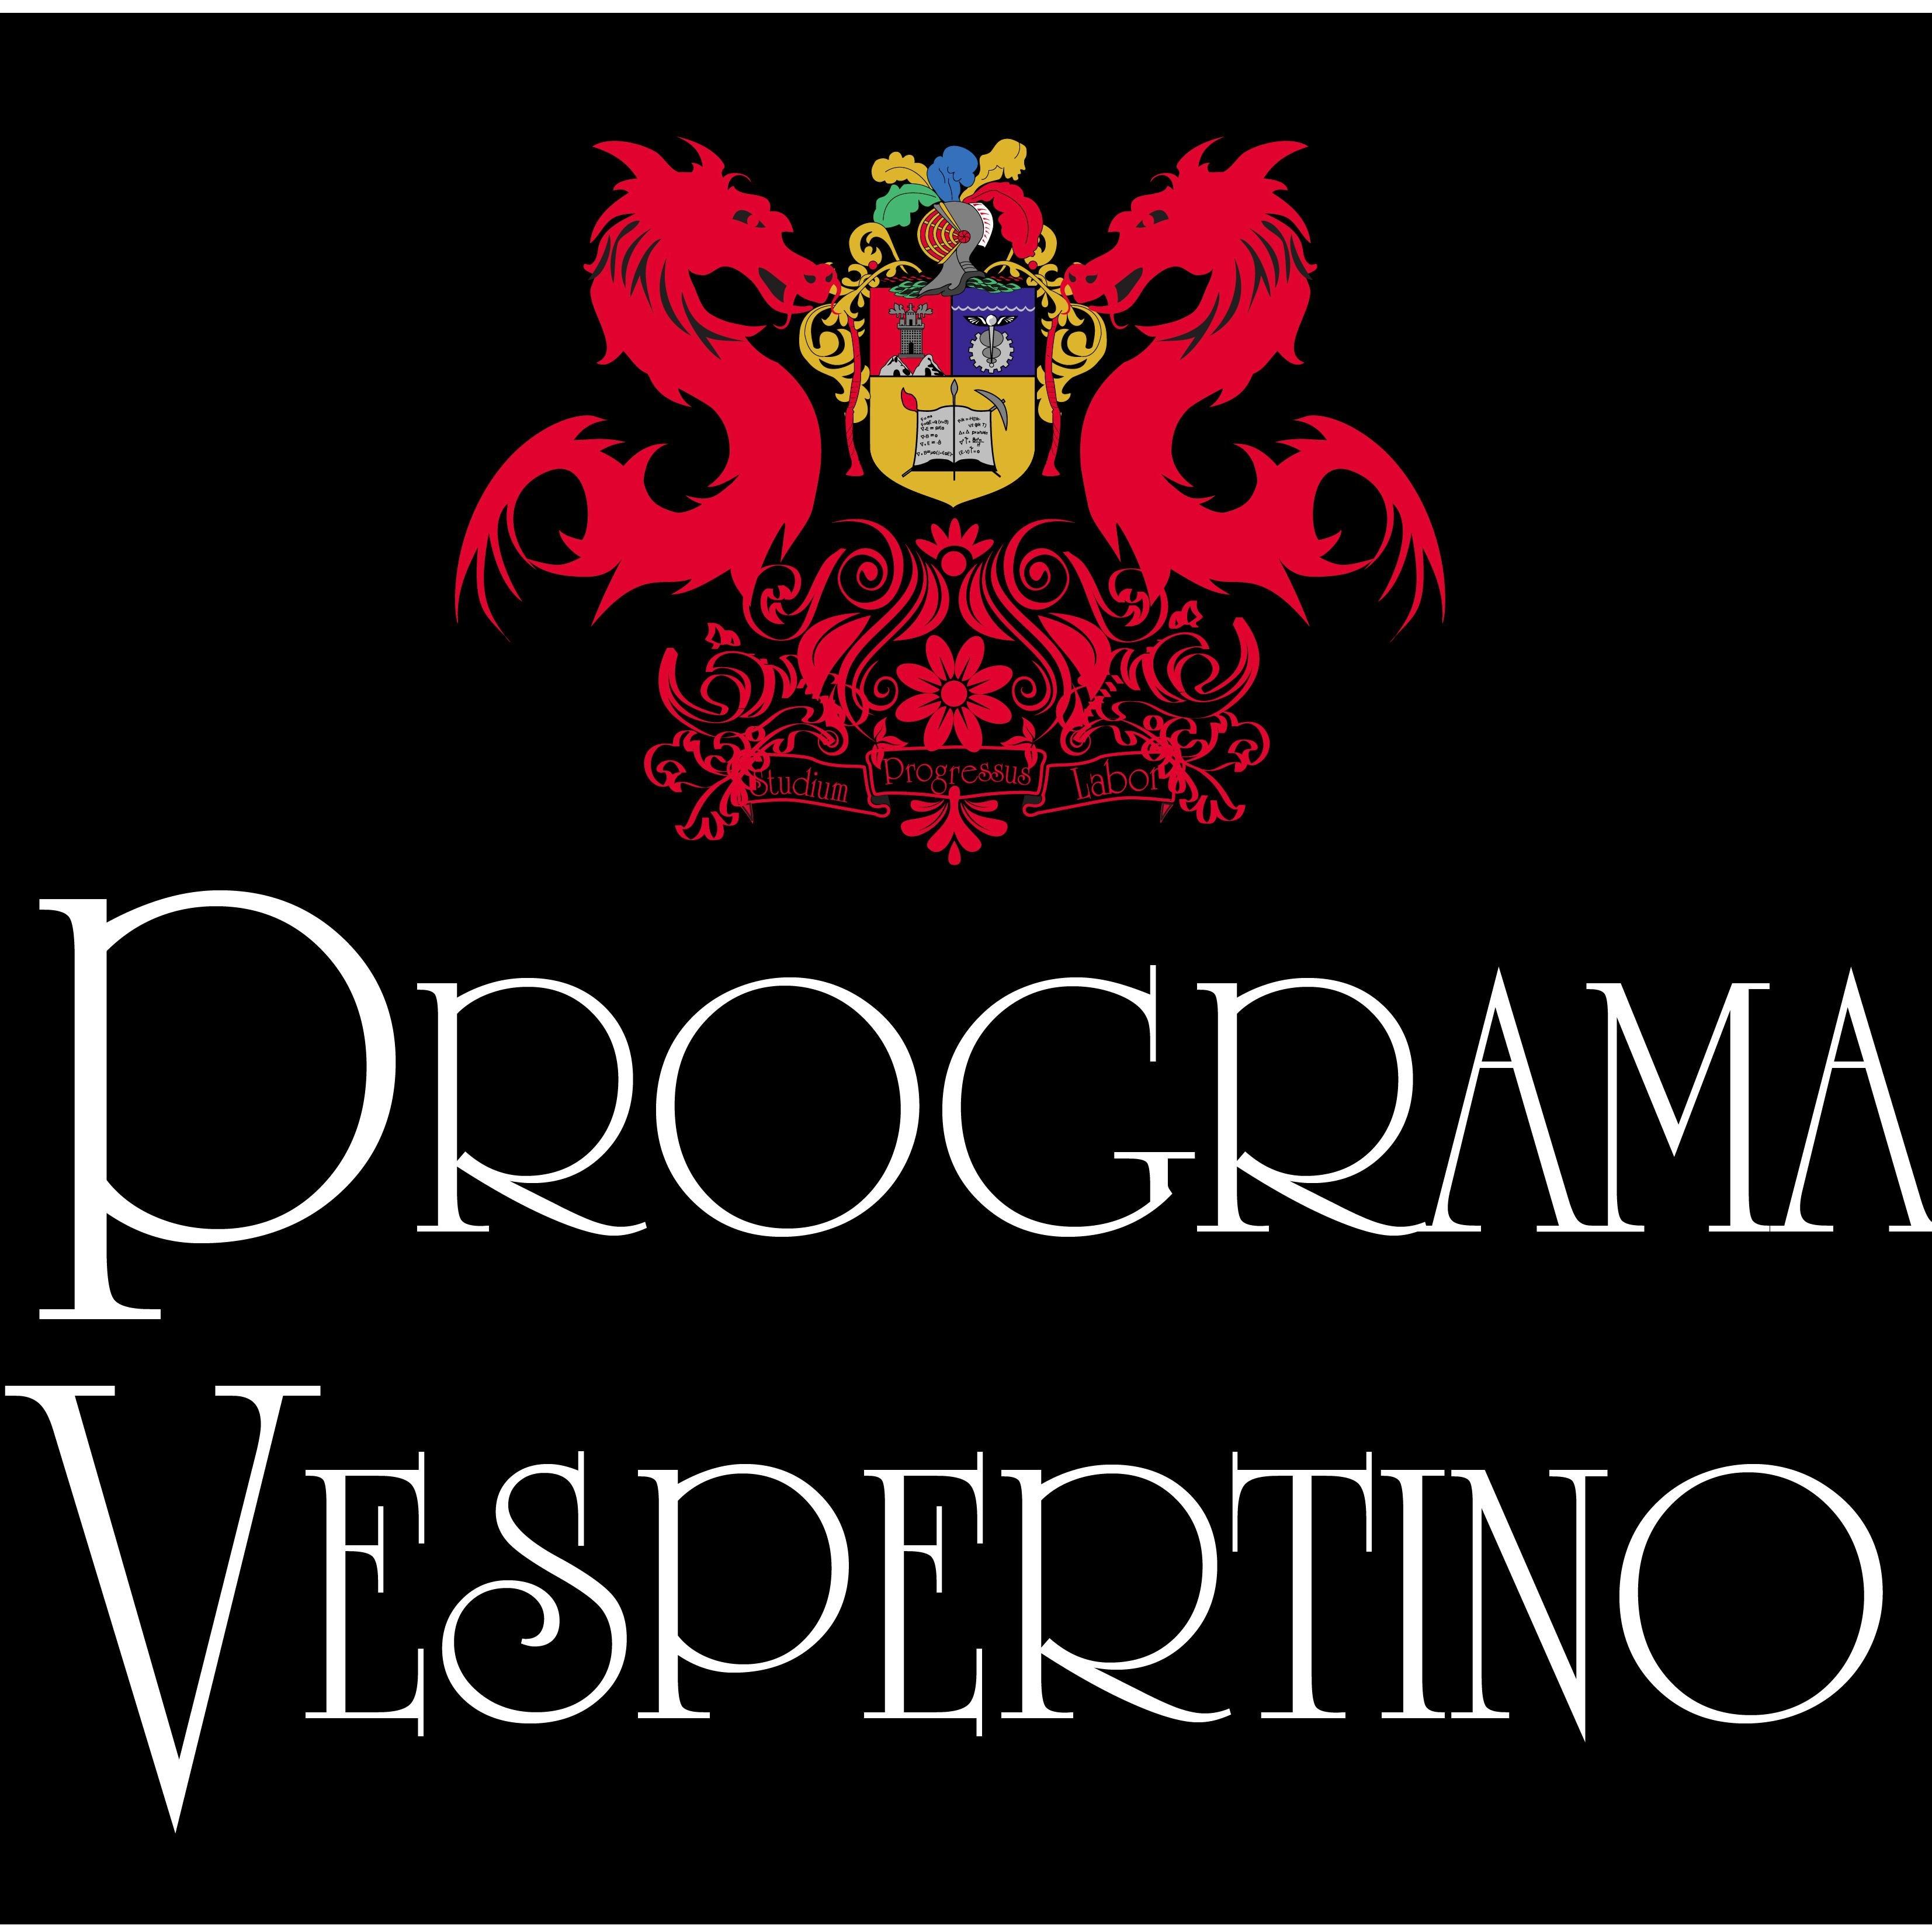 @USFQ_Vespertino